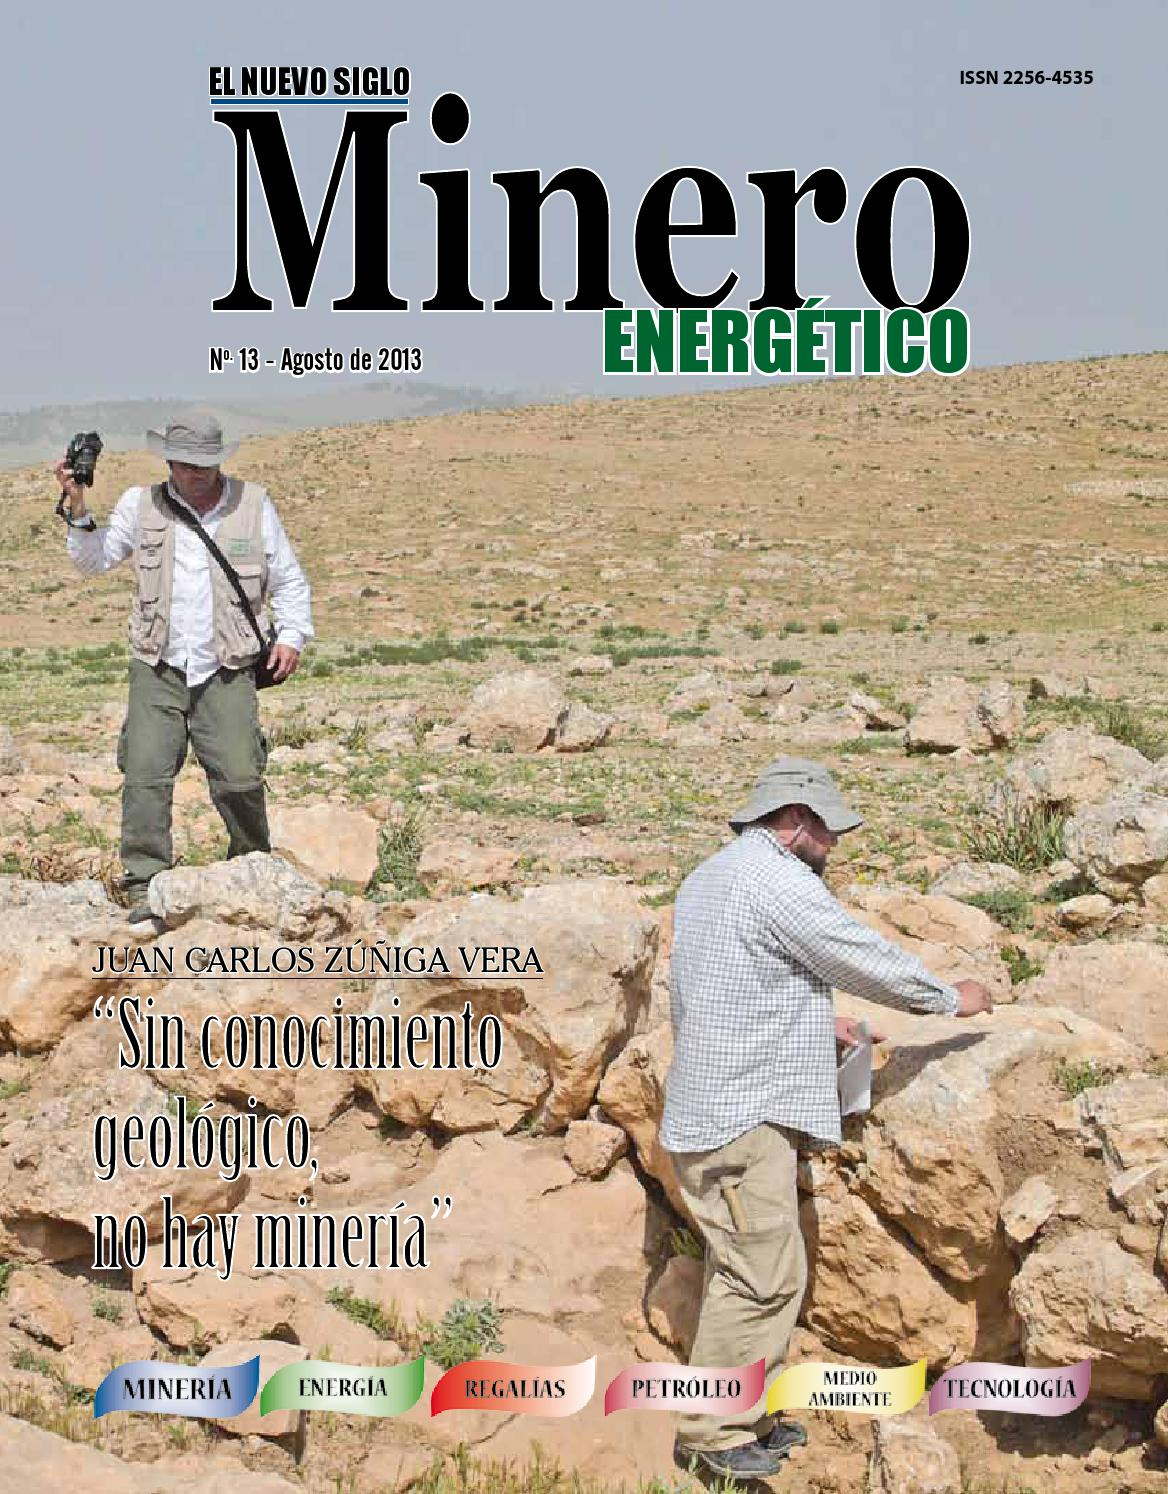 Minero Energético by Esteban Lugo Perea - issuu